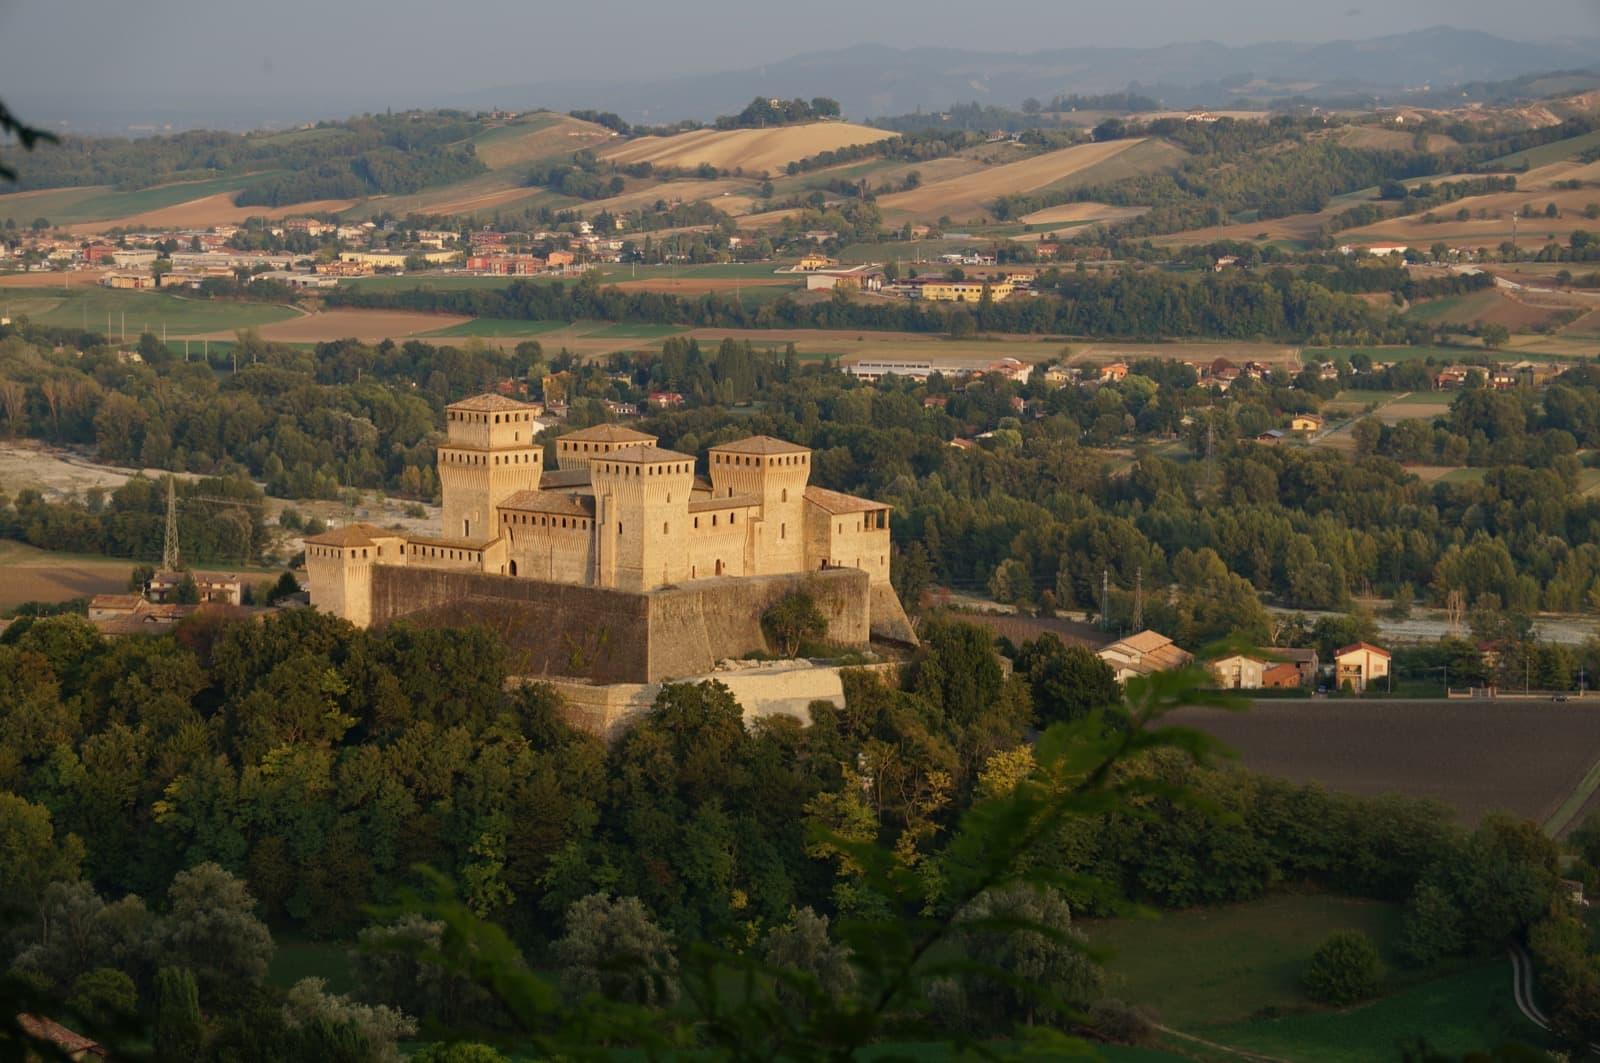 Langhirano (PR), Torrechiara Castle, Ph. Marco Tommesani